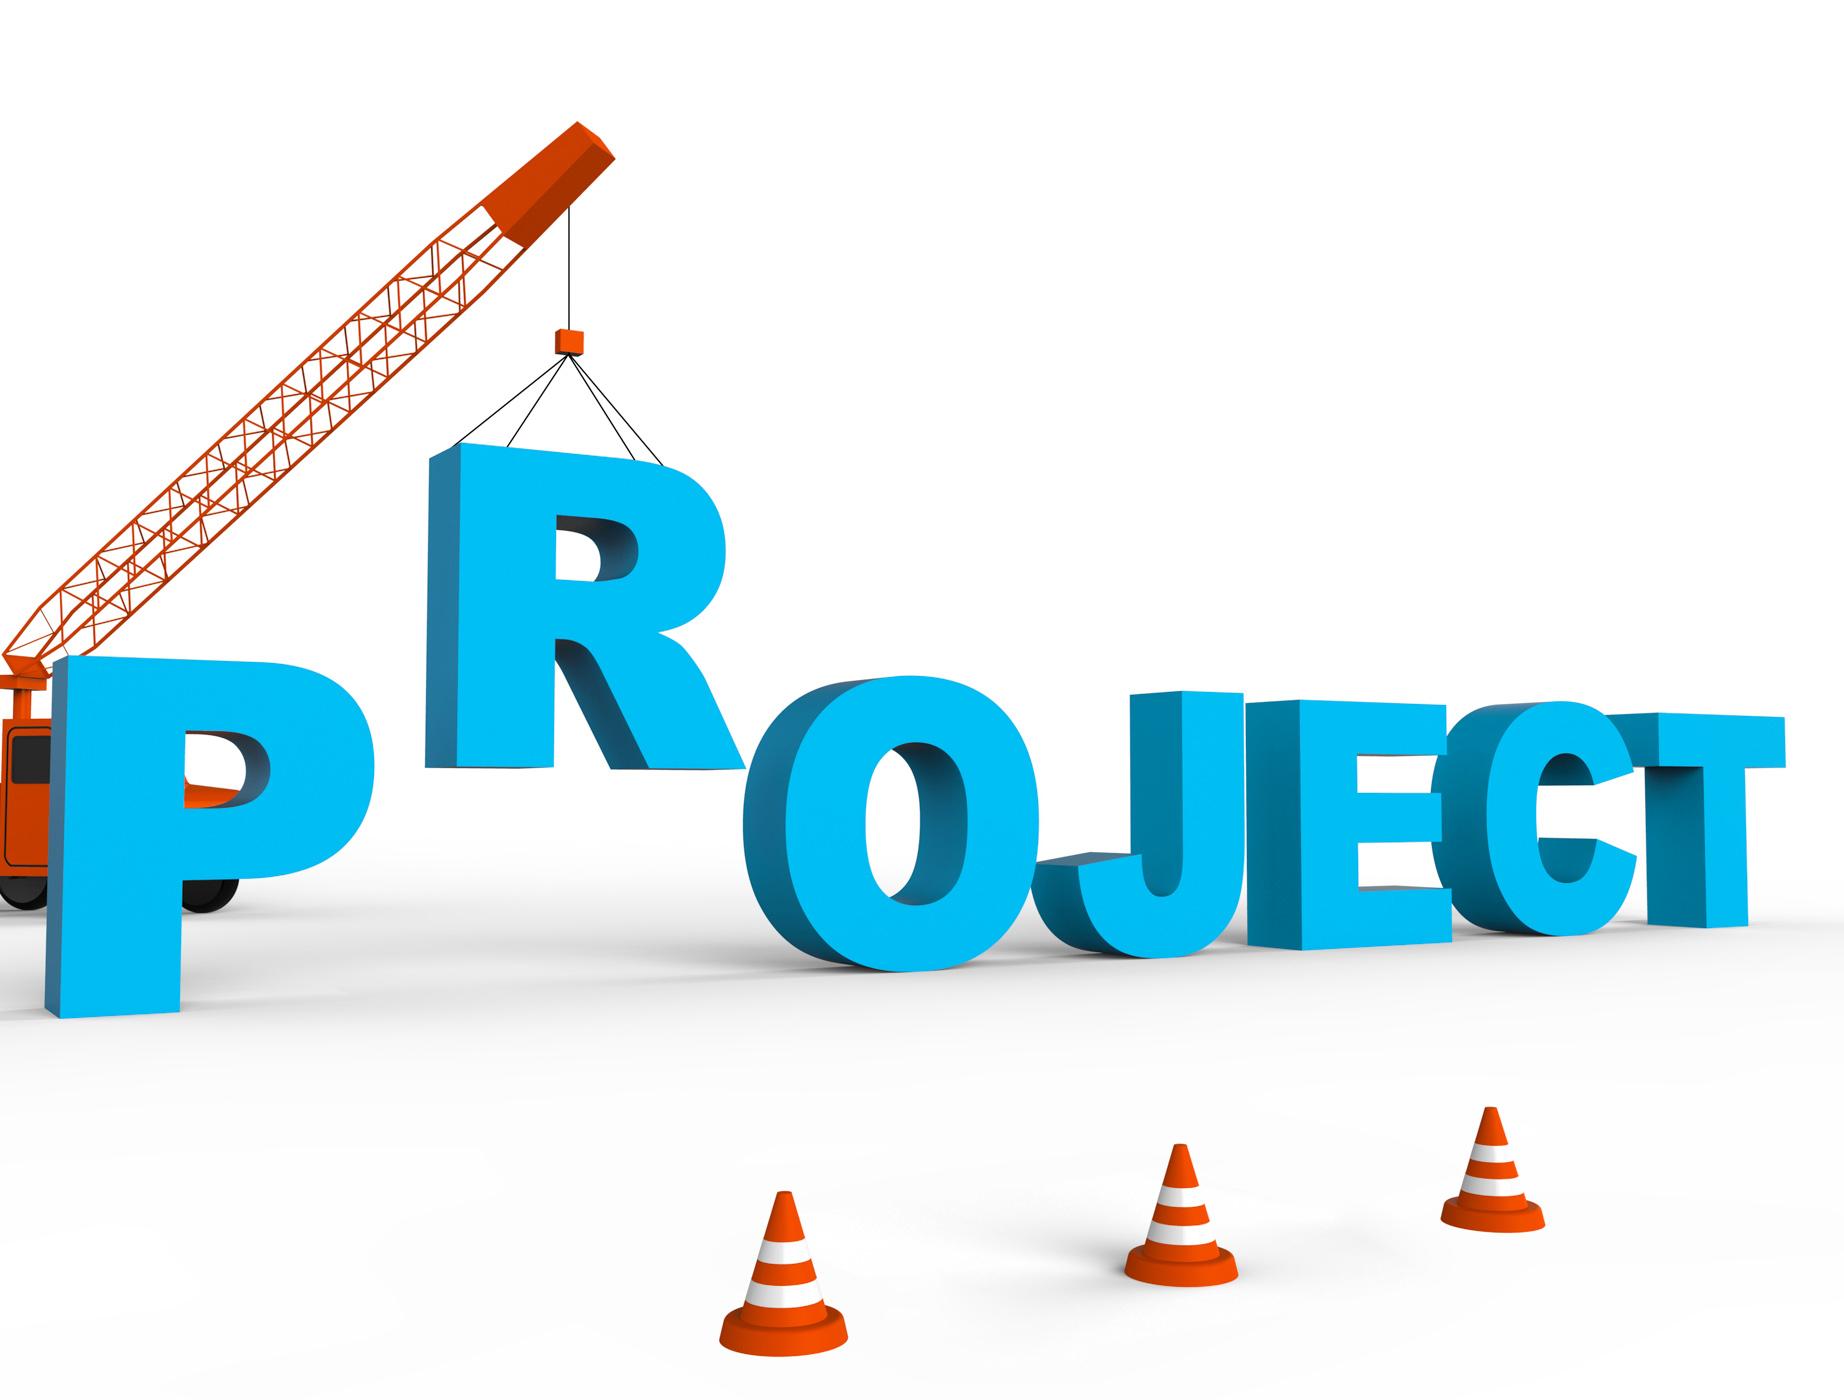 Build Project Indicates Building Scheme And Tasks 3d Rendering, 3drendering, Programme, Tasks, Task, HQ Photo